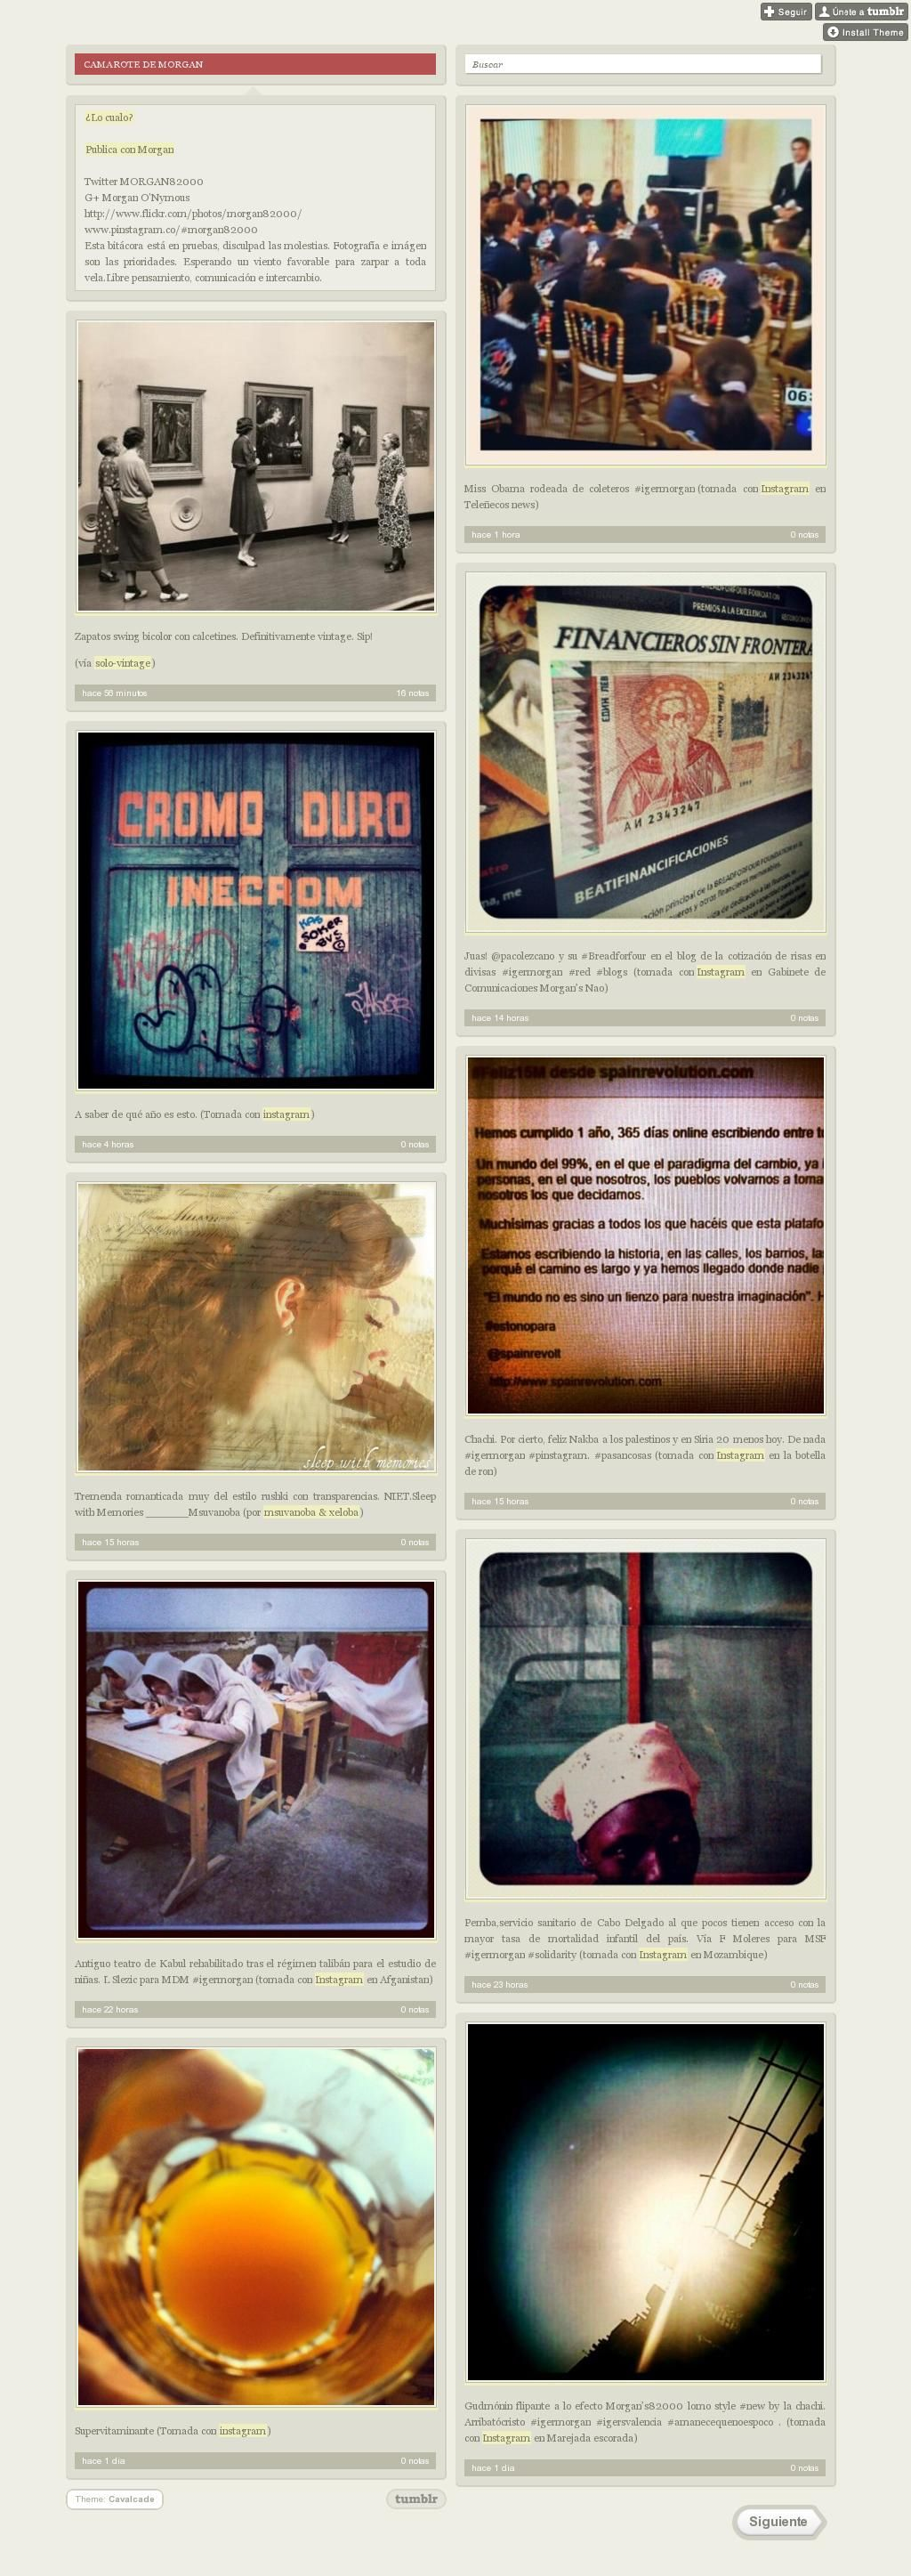 The website 'morgan82000.tumblr.com' courtesy of Pinstamatic (http://pinstamatic.com)